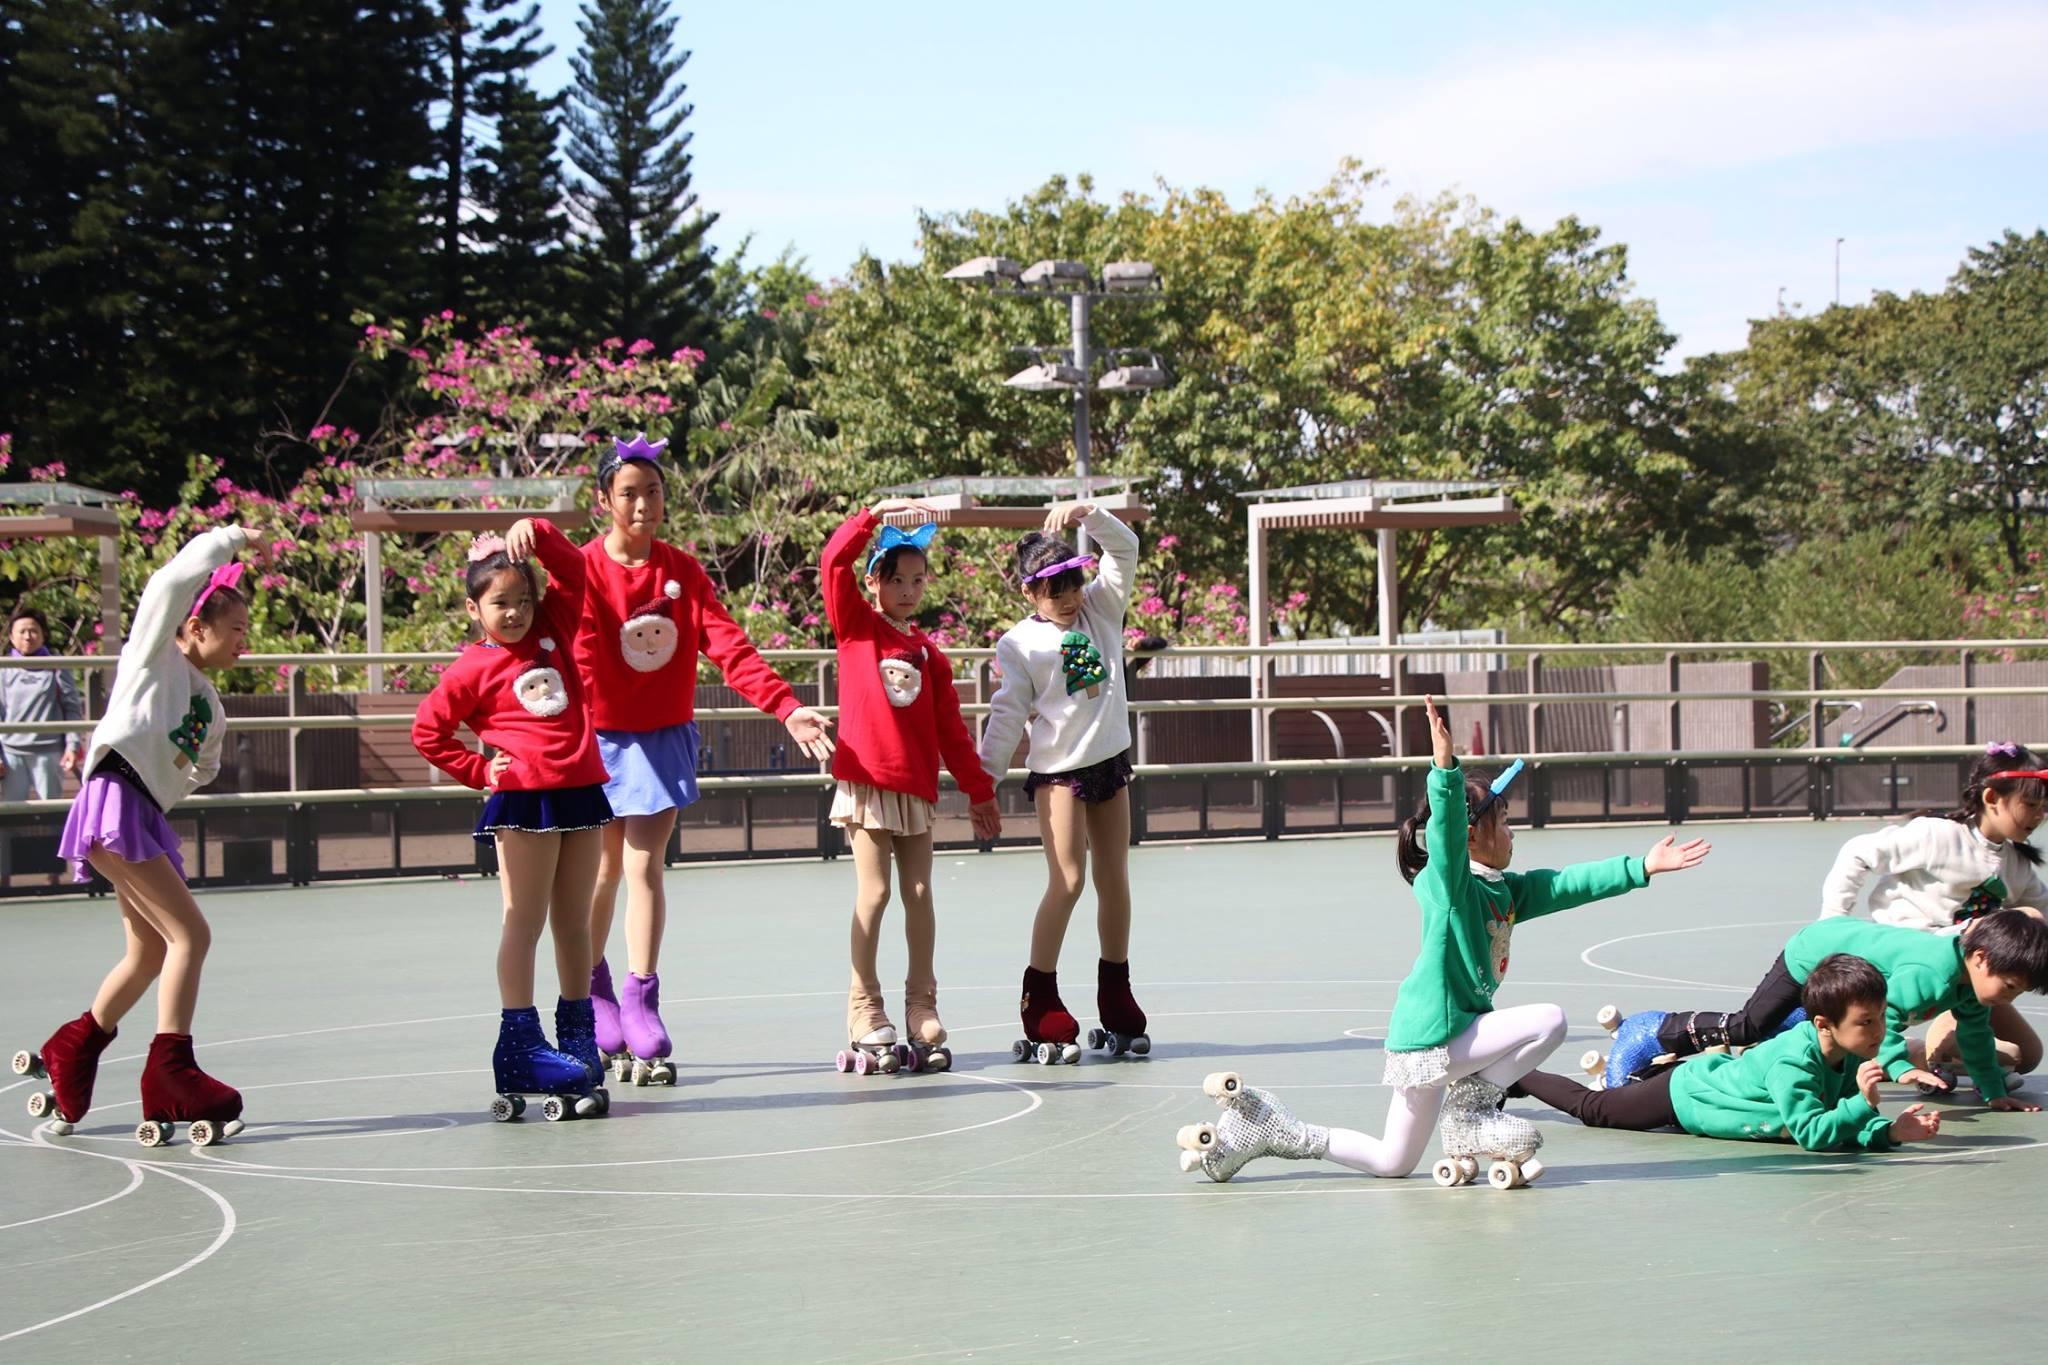 Skate Victoria2017 group.jpg